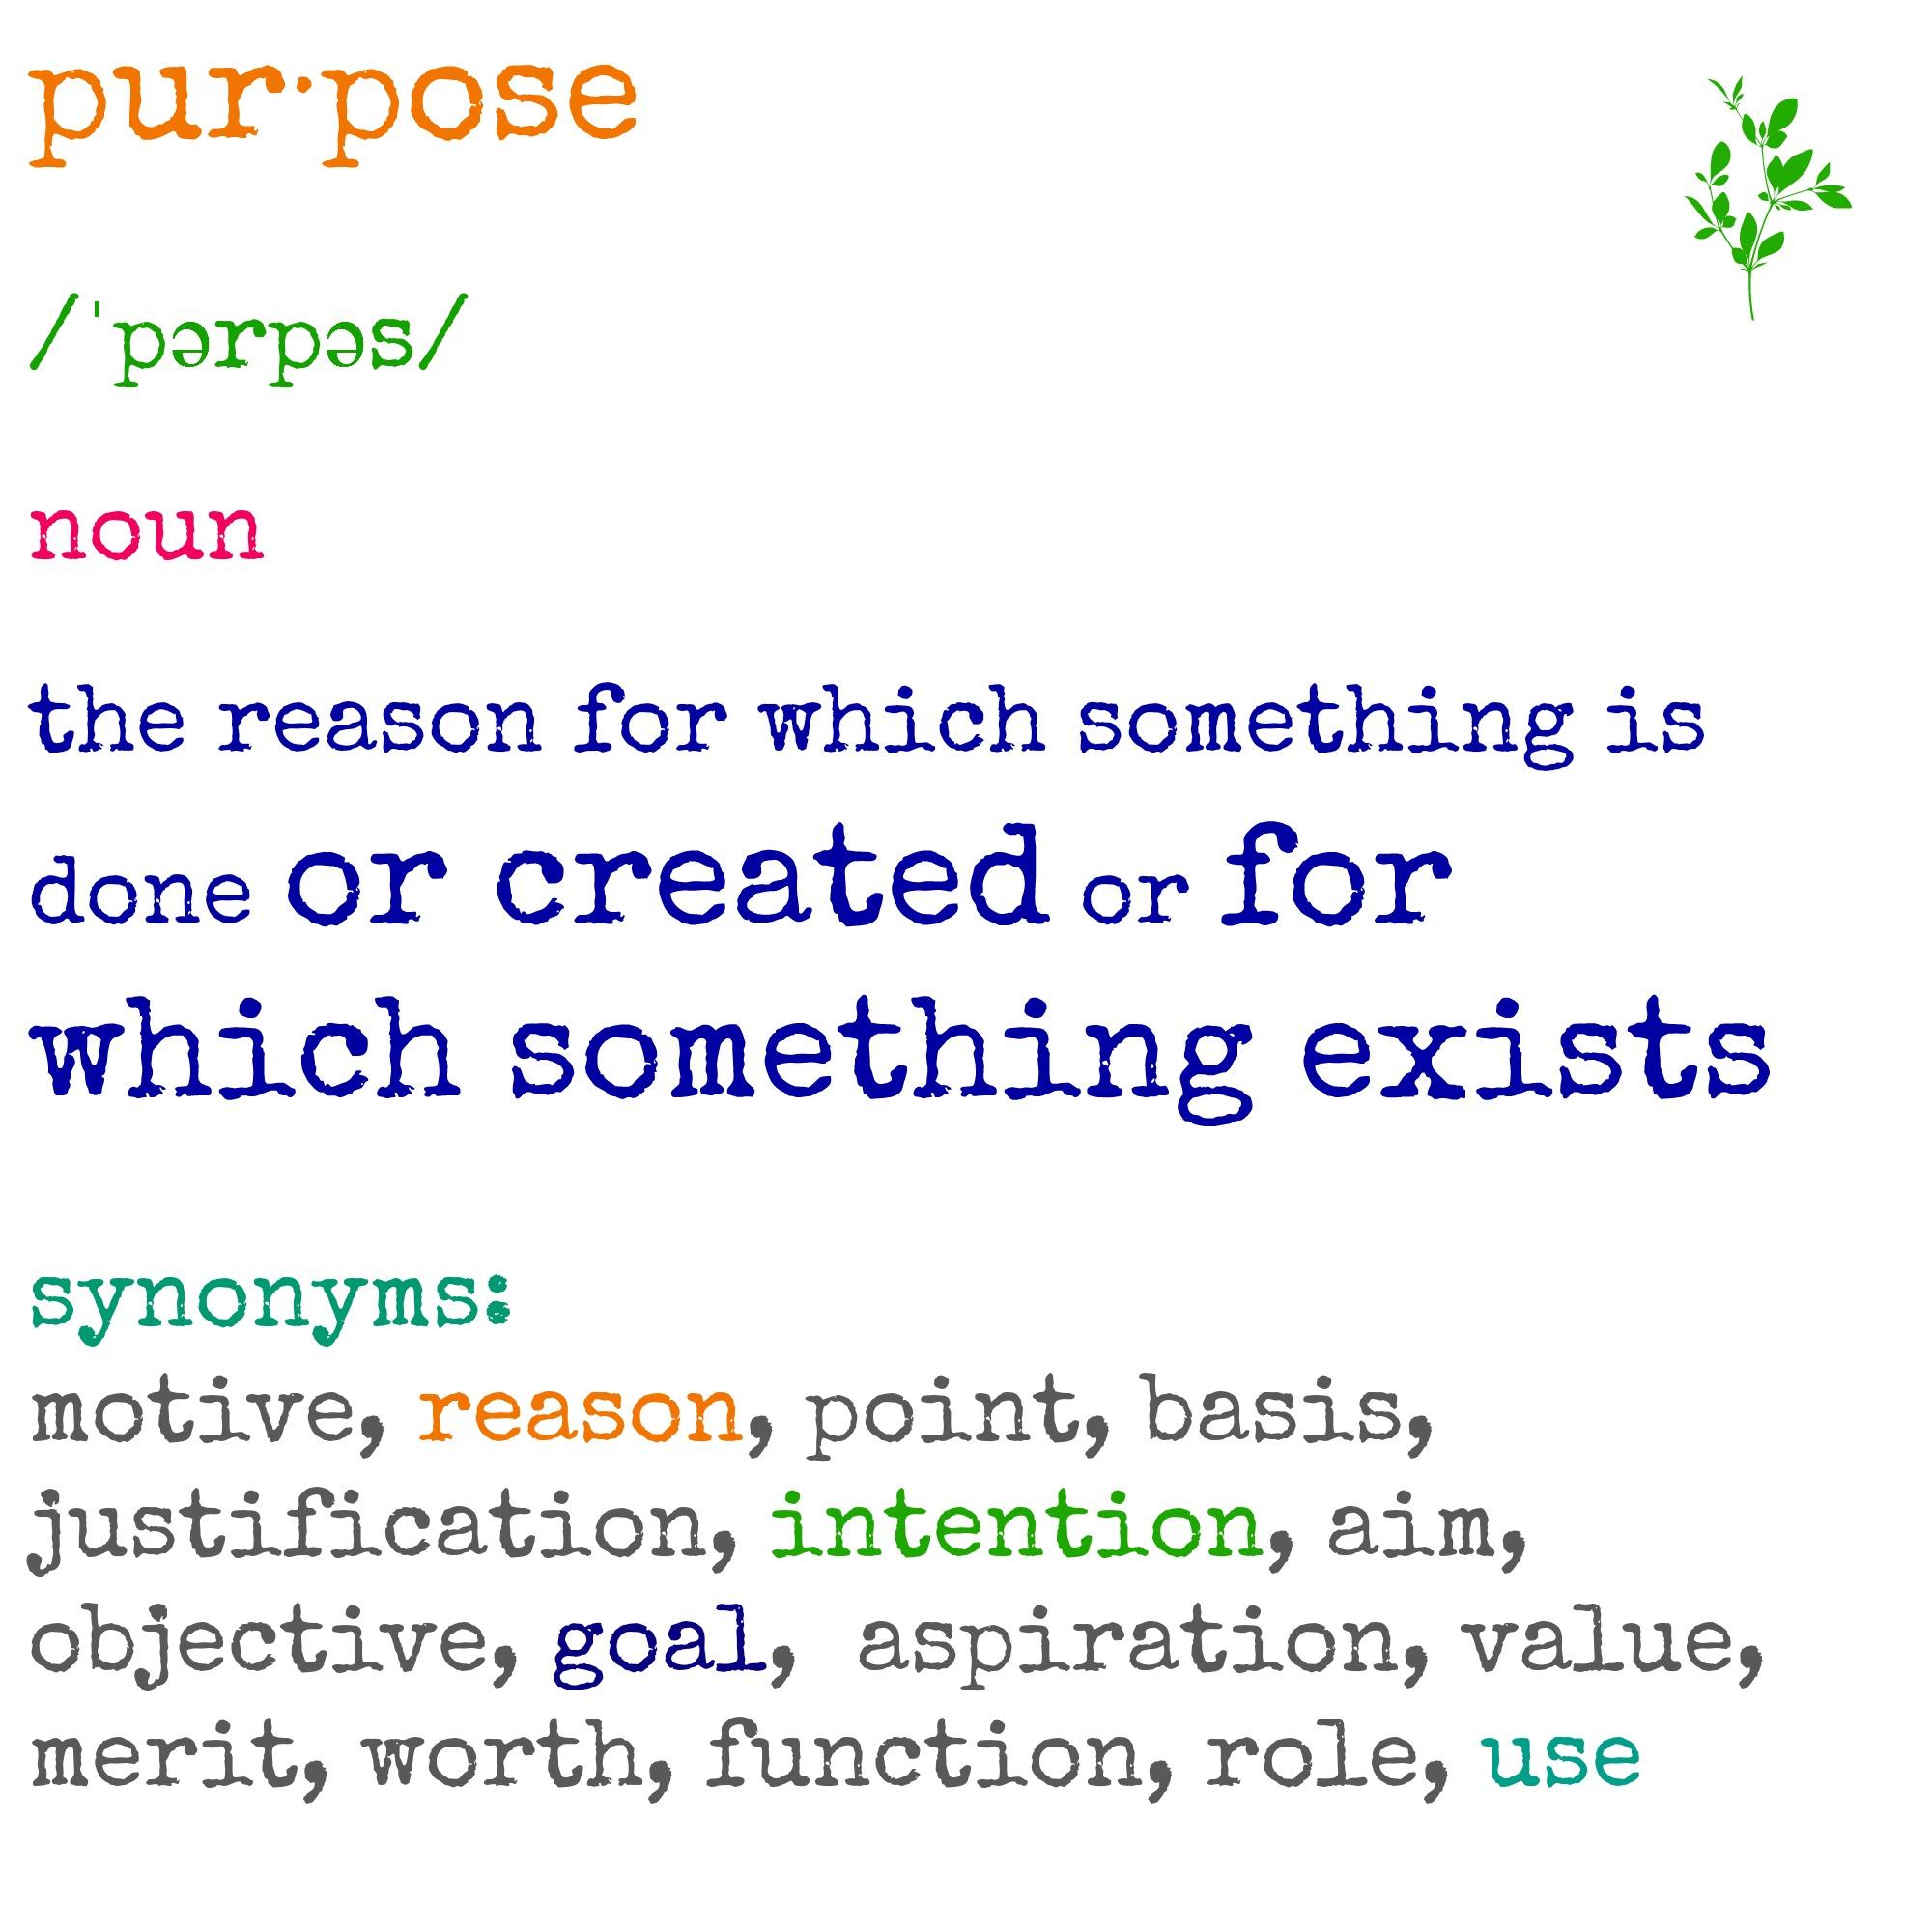 in purpose definition